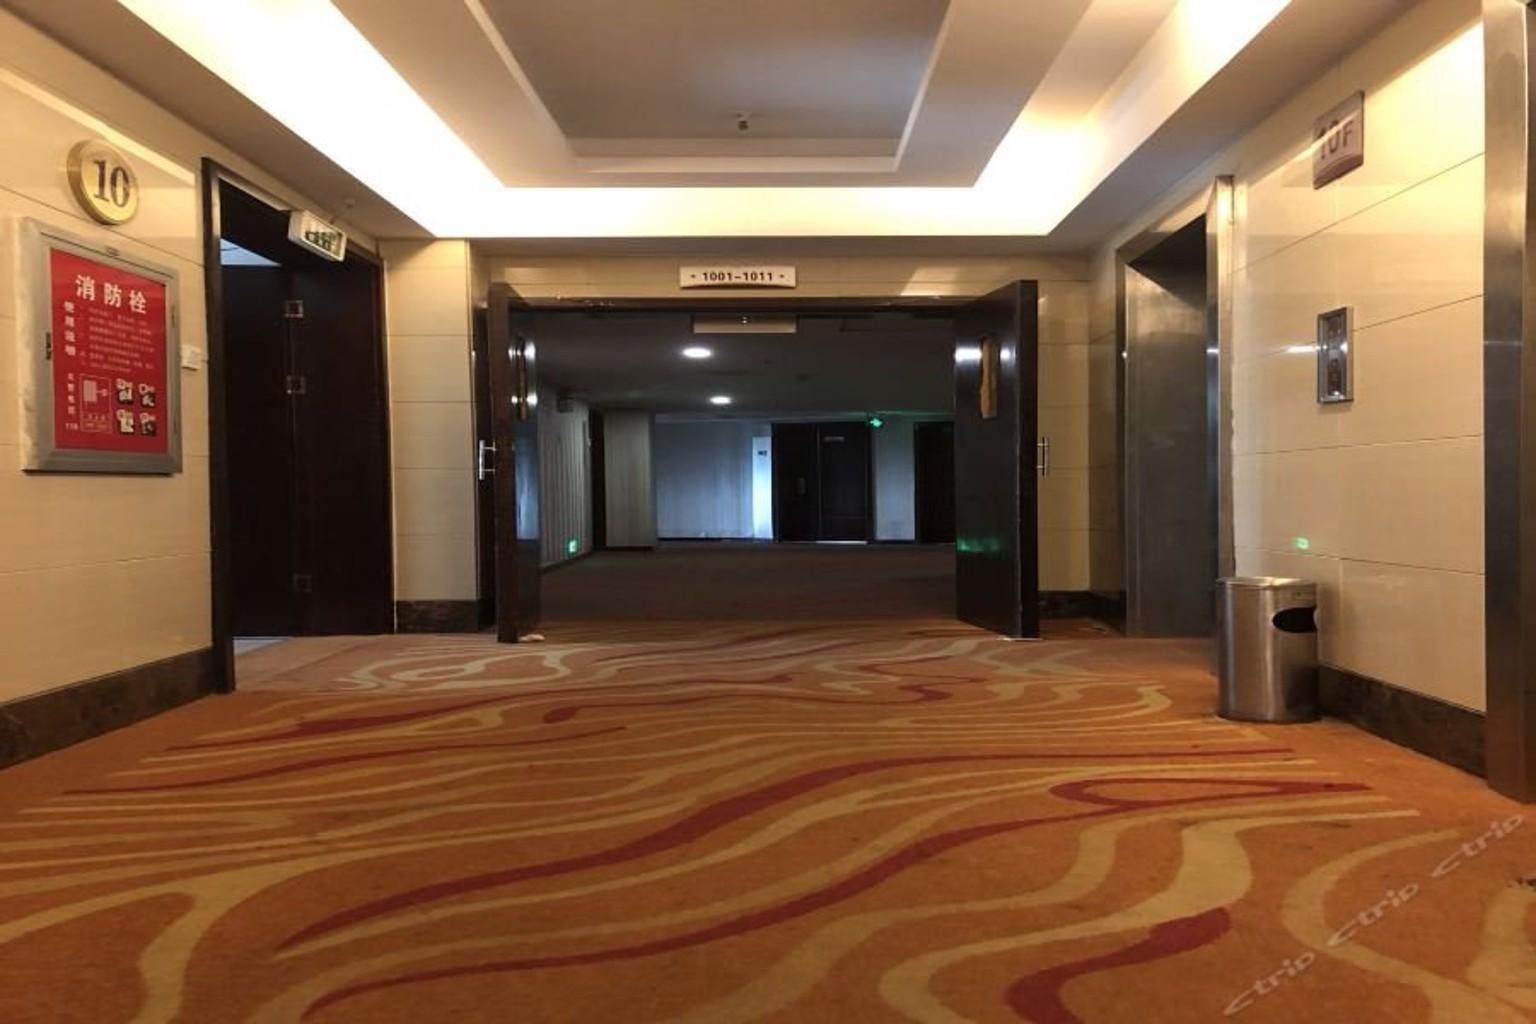 Gallery image of Longtan Hotel